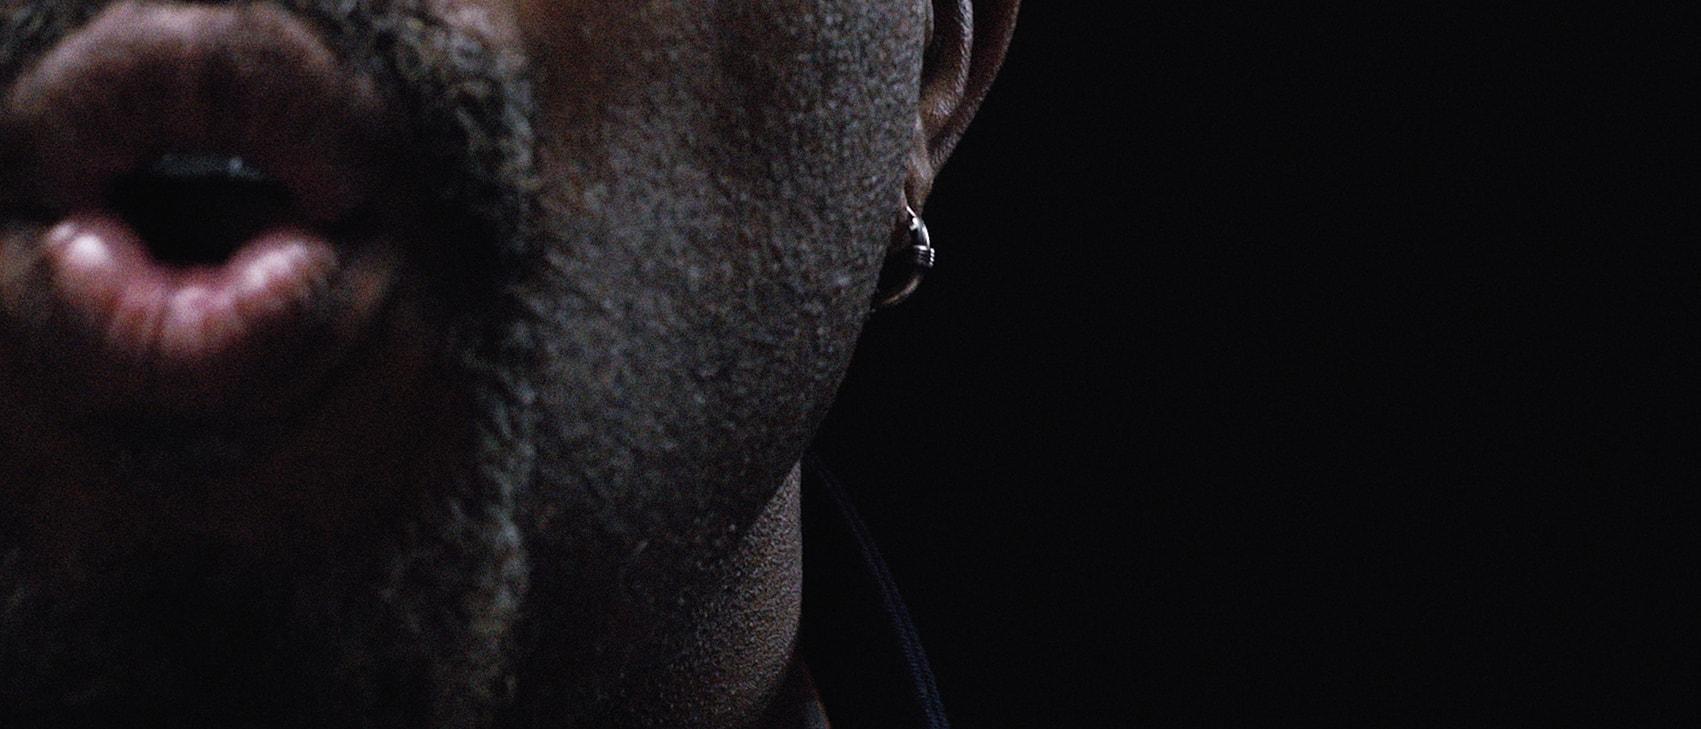 delgres, pascaldanae, creole, guandeloupe, louisiane, clipmusical, clips2018, clipdelgres, remysolomon,